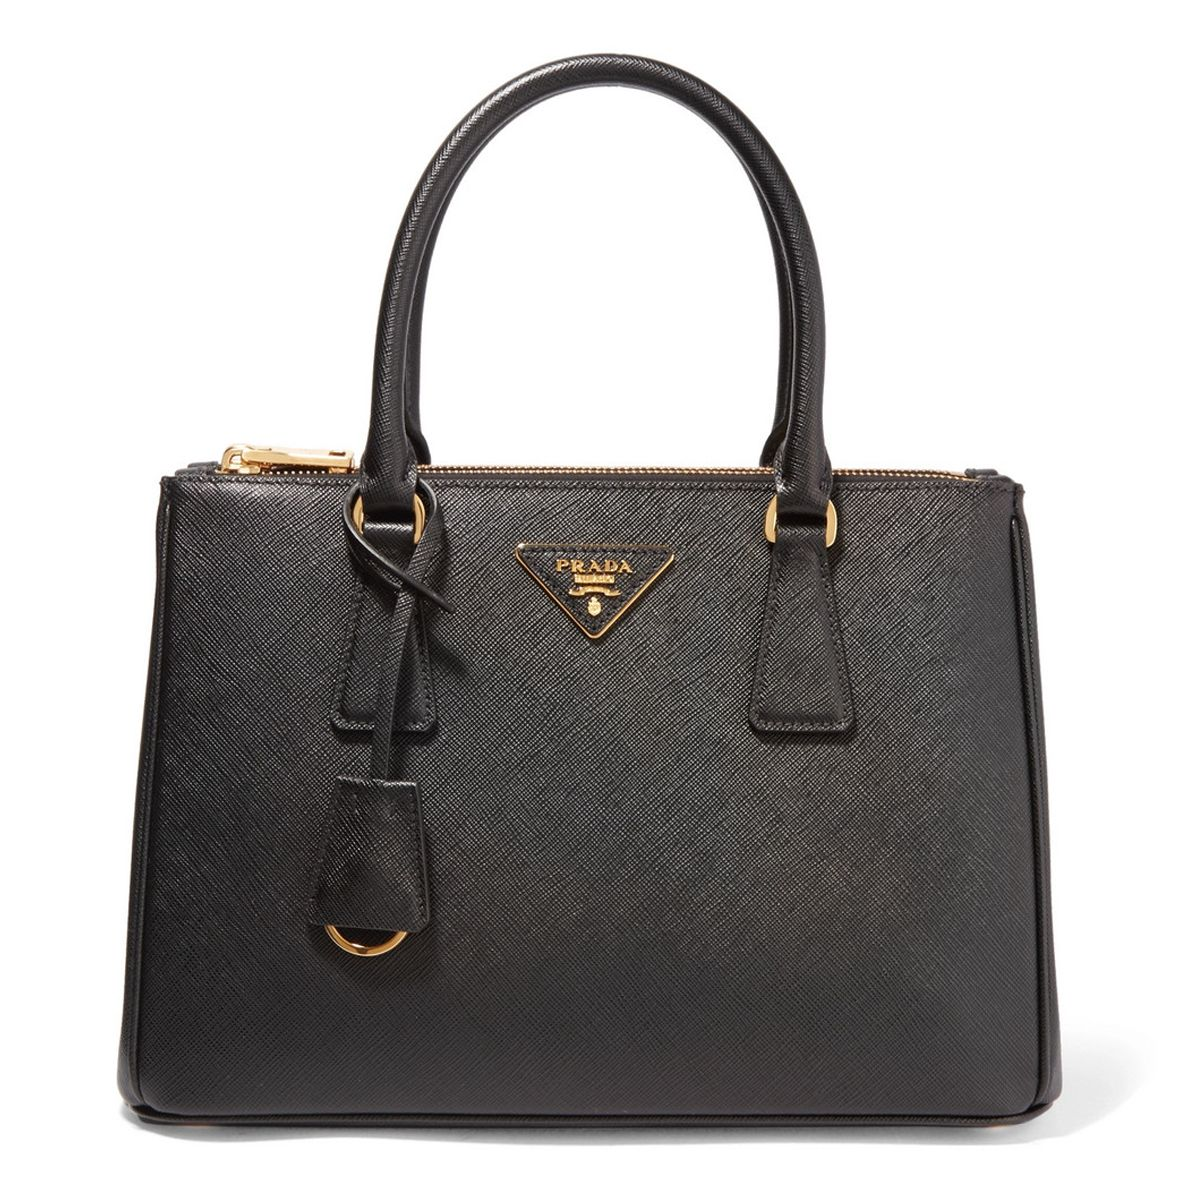 classic-designer-handbag-brands-271996-1541601783441-product.1200x0c.jpg (1200×1200)